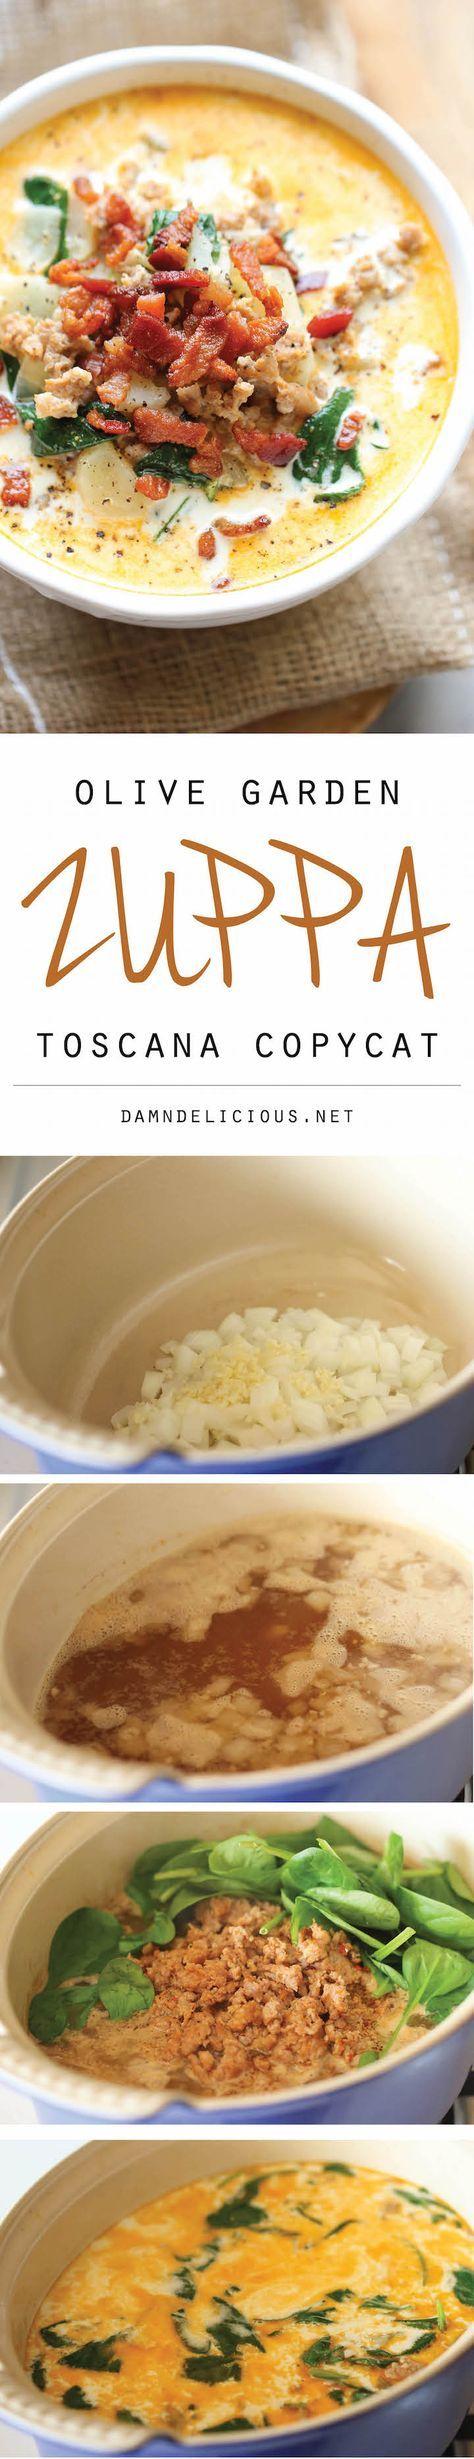 Olive Garden Zuppa Toscana Copycat Recipe Food recipes